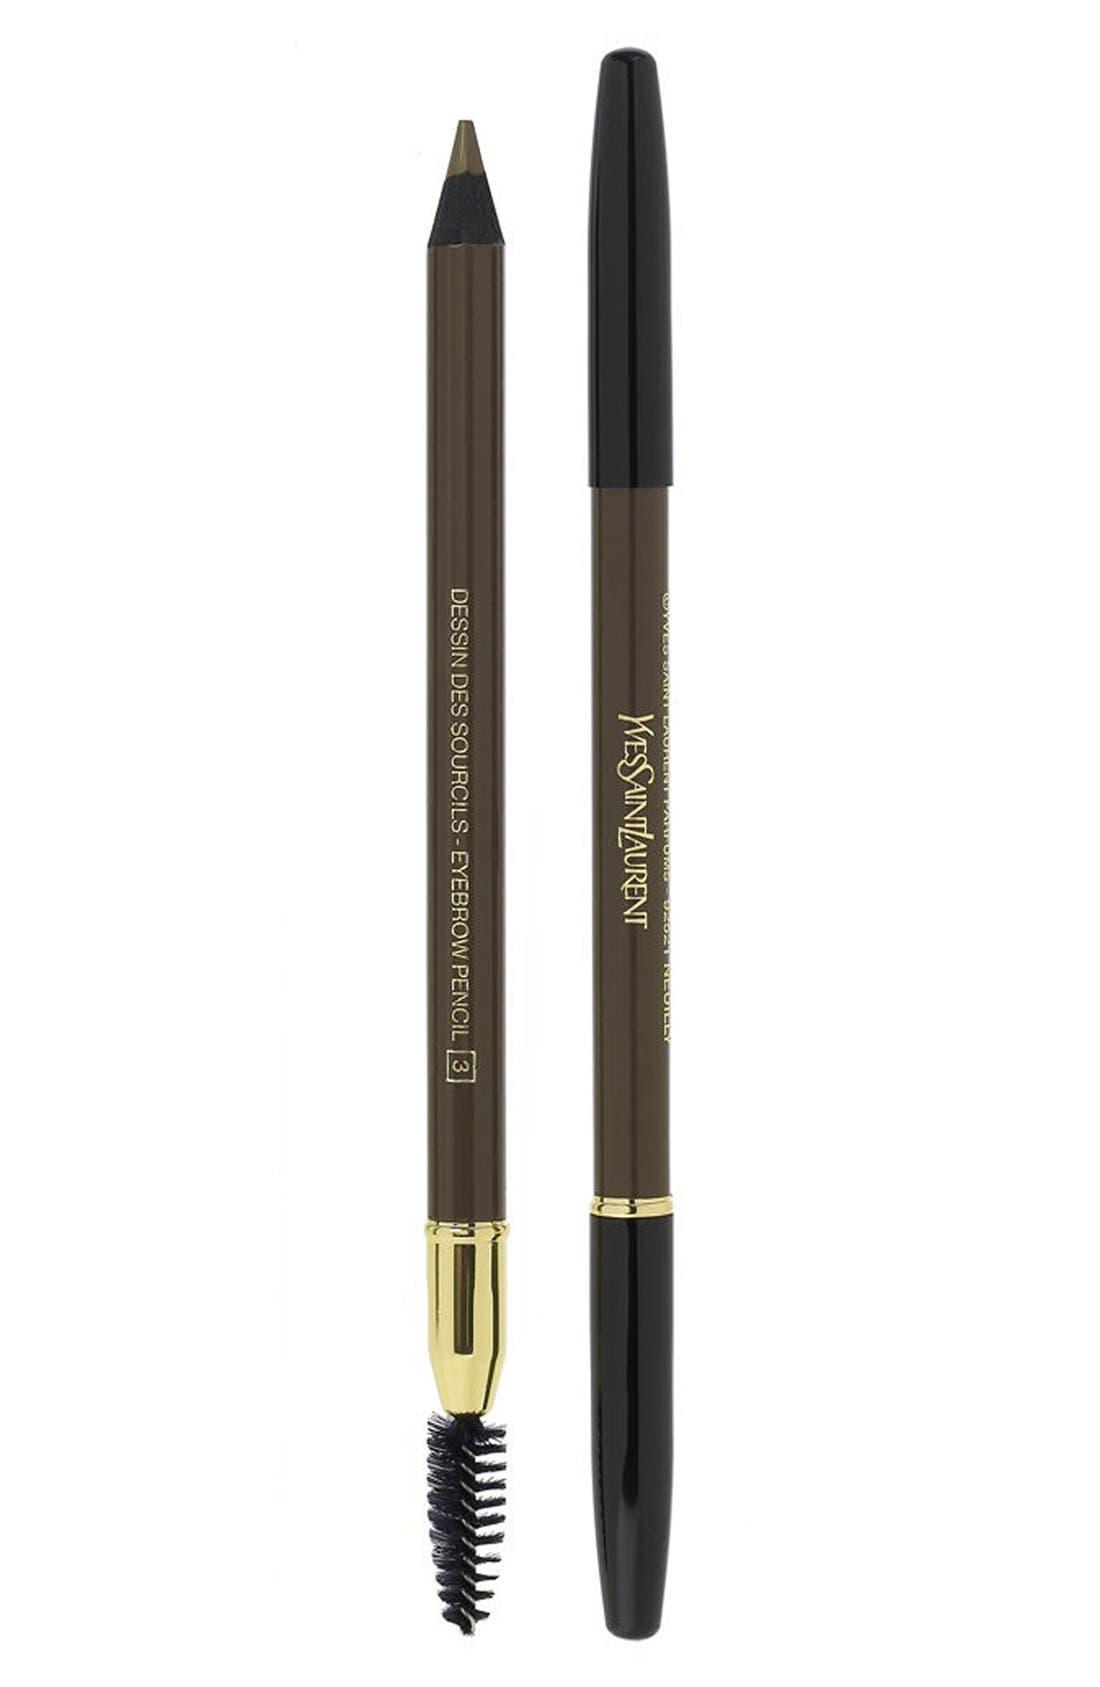 Yves Saint Laurent Eyebrow Pencil - 003 Glazed Brown